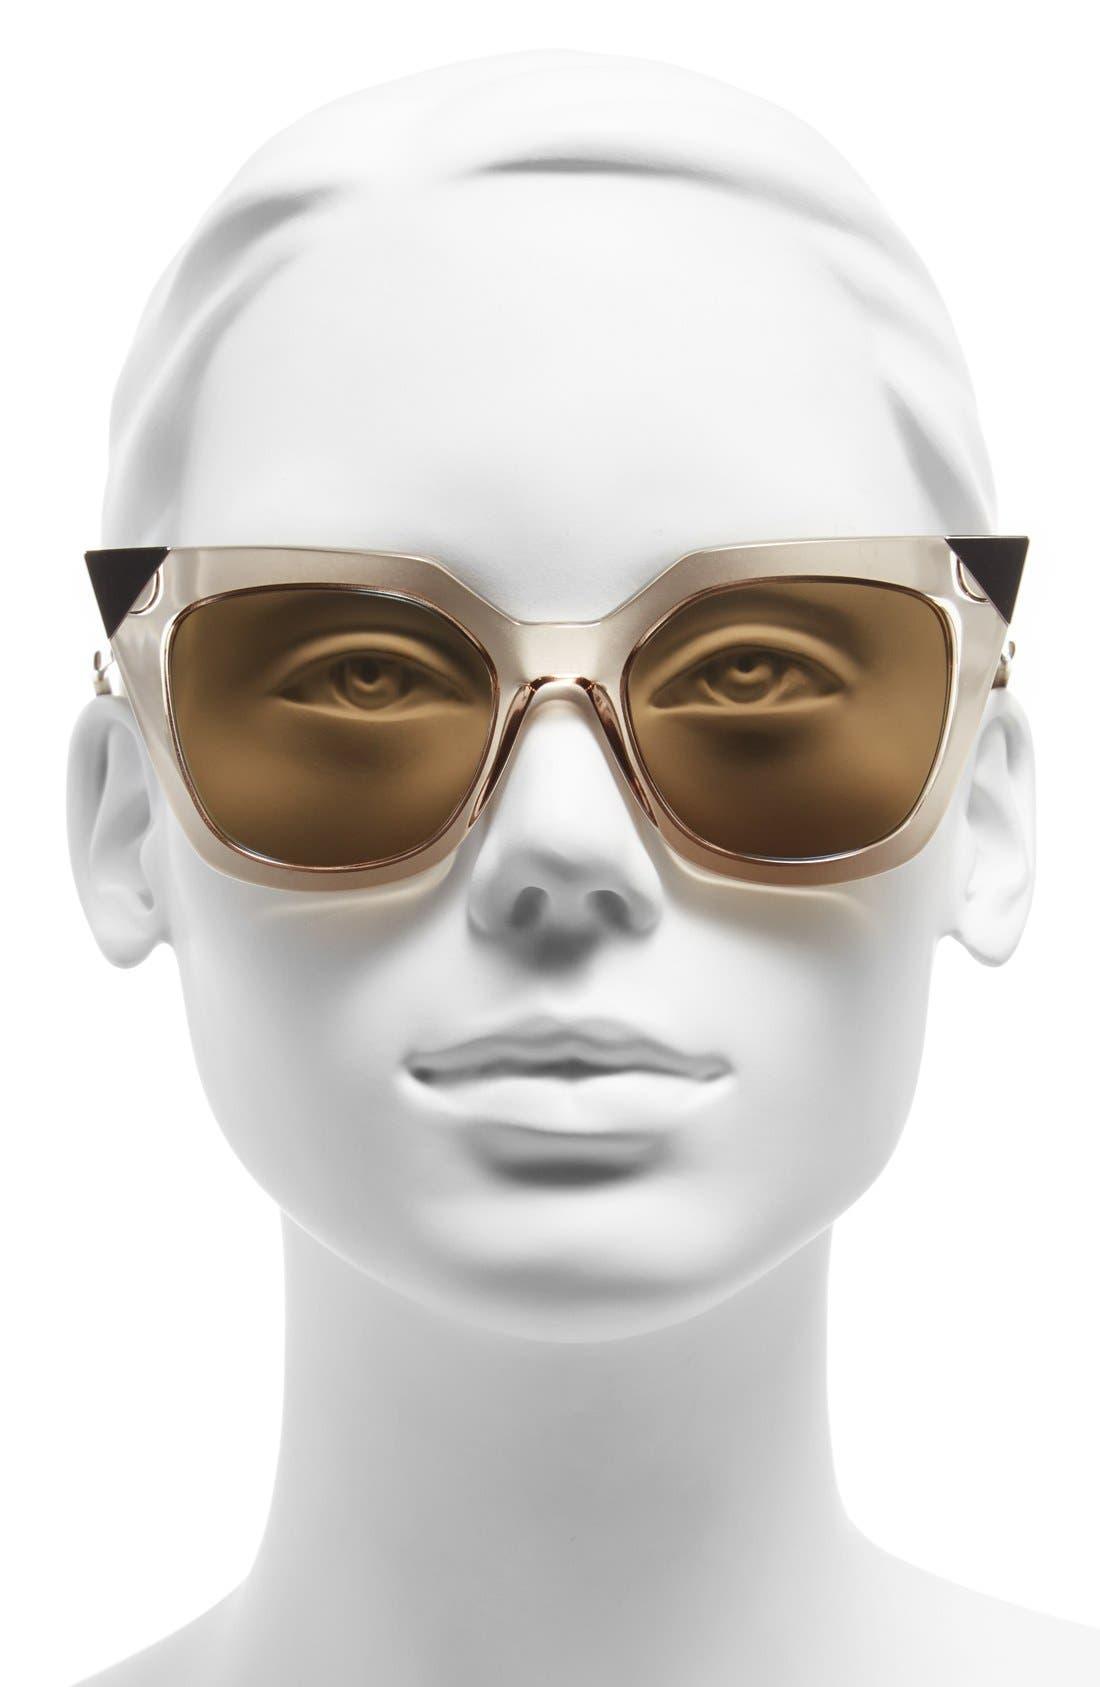 52mm Cat Eye Sunglasses,                             Alternate thumbnail 10, color,